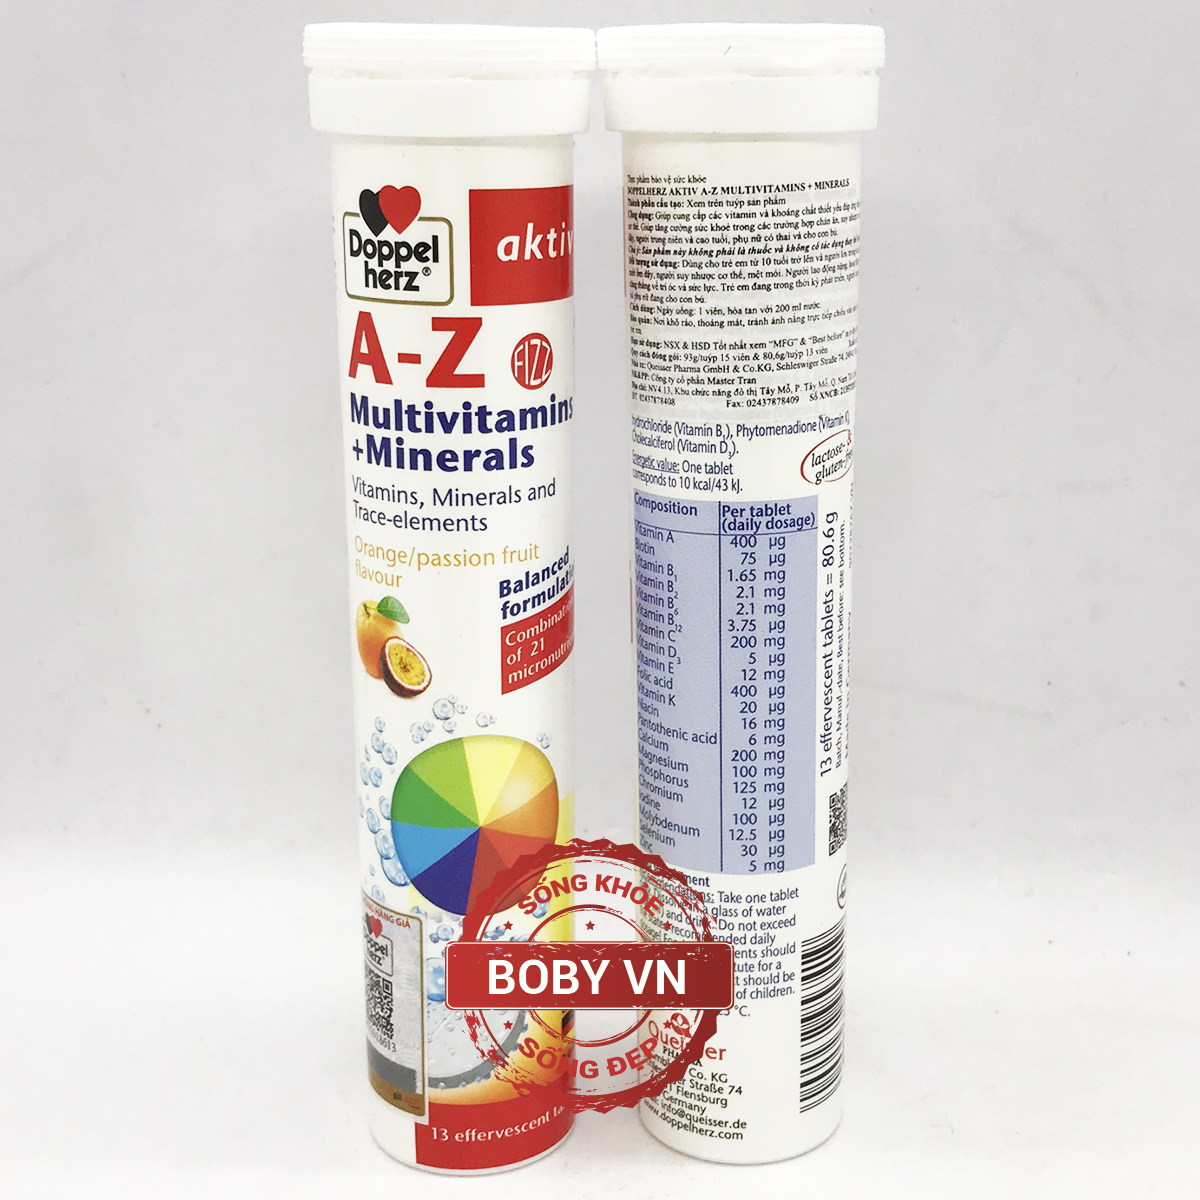 Doppelherz Aktiv A-Z MULTIVITAMINS + MINERALS - Vitamin tổng hợp - Đức